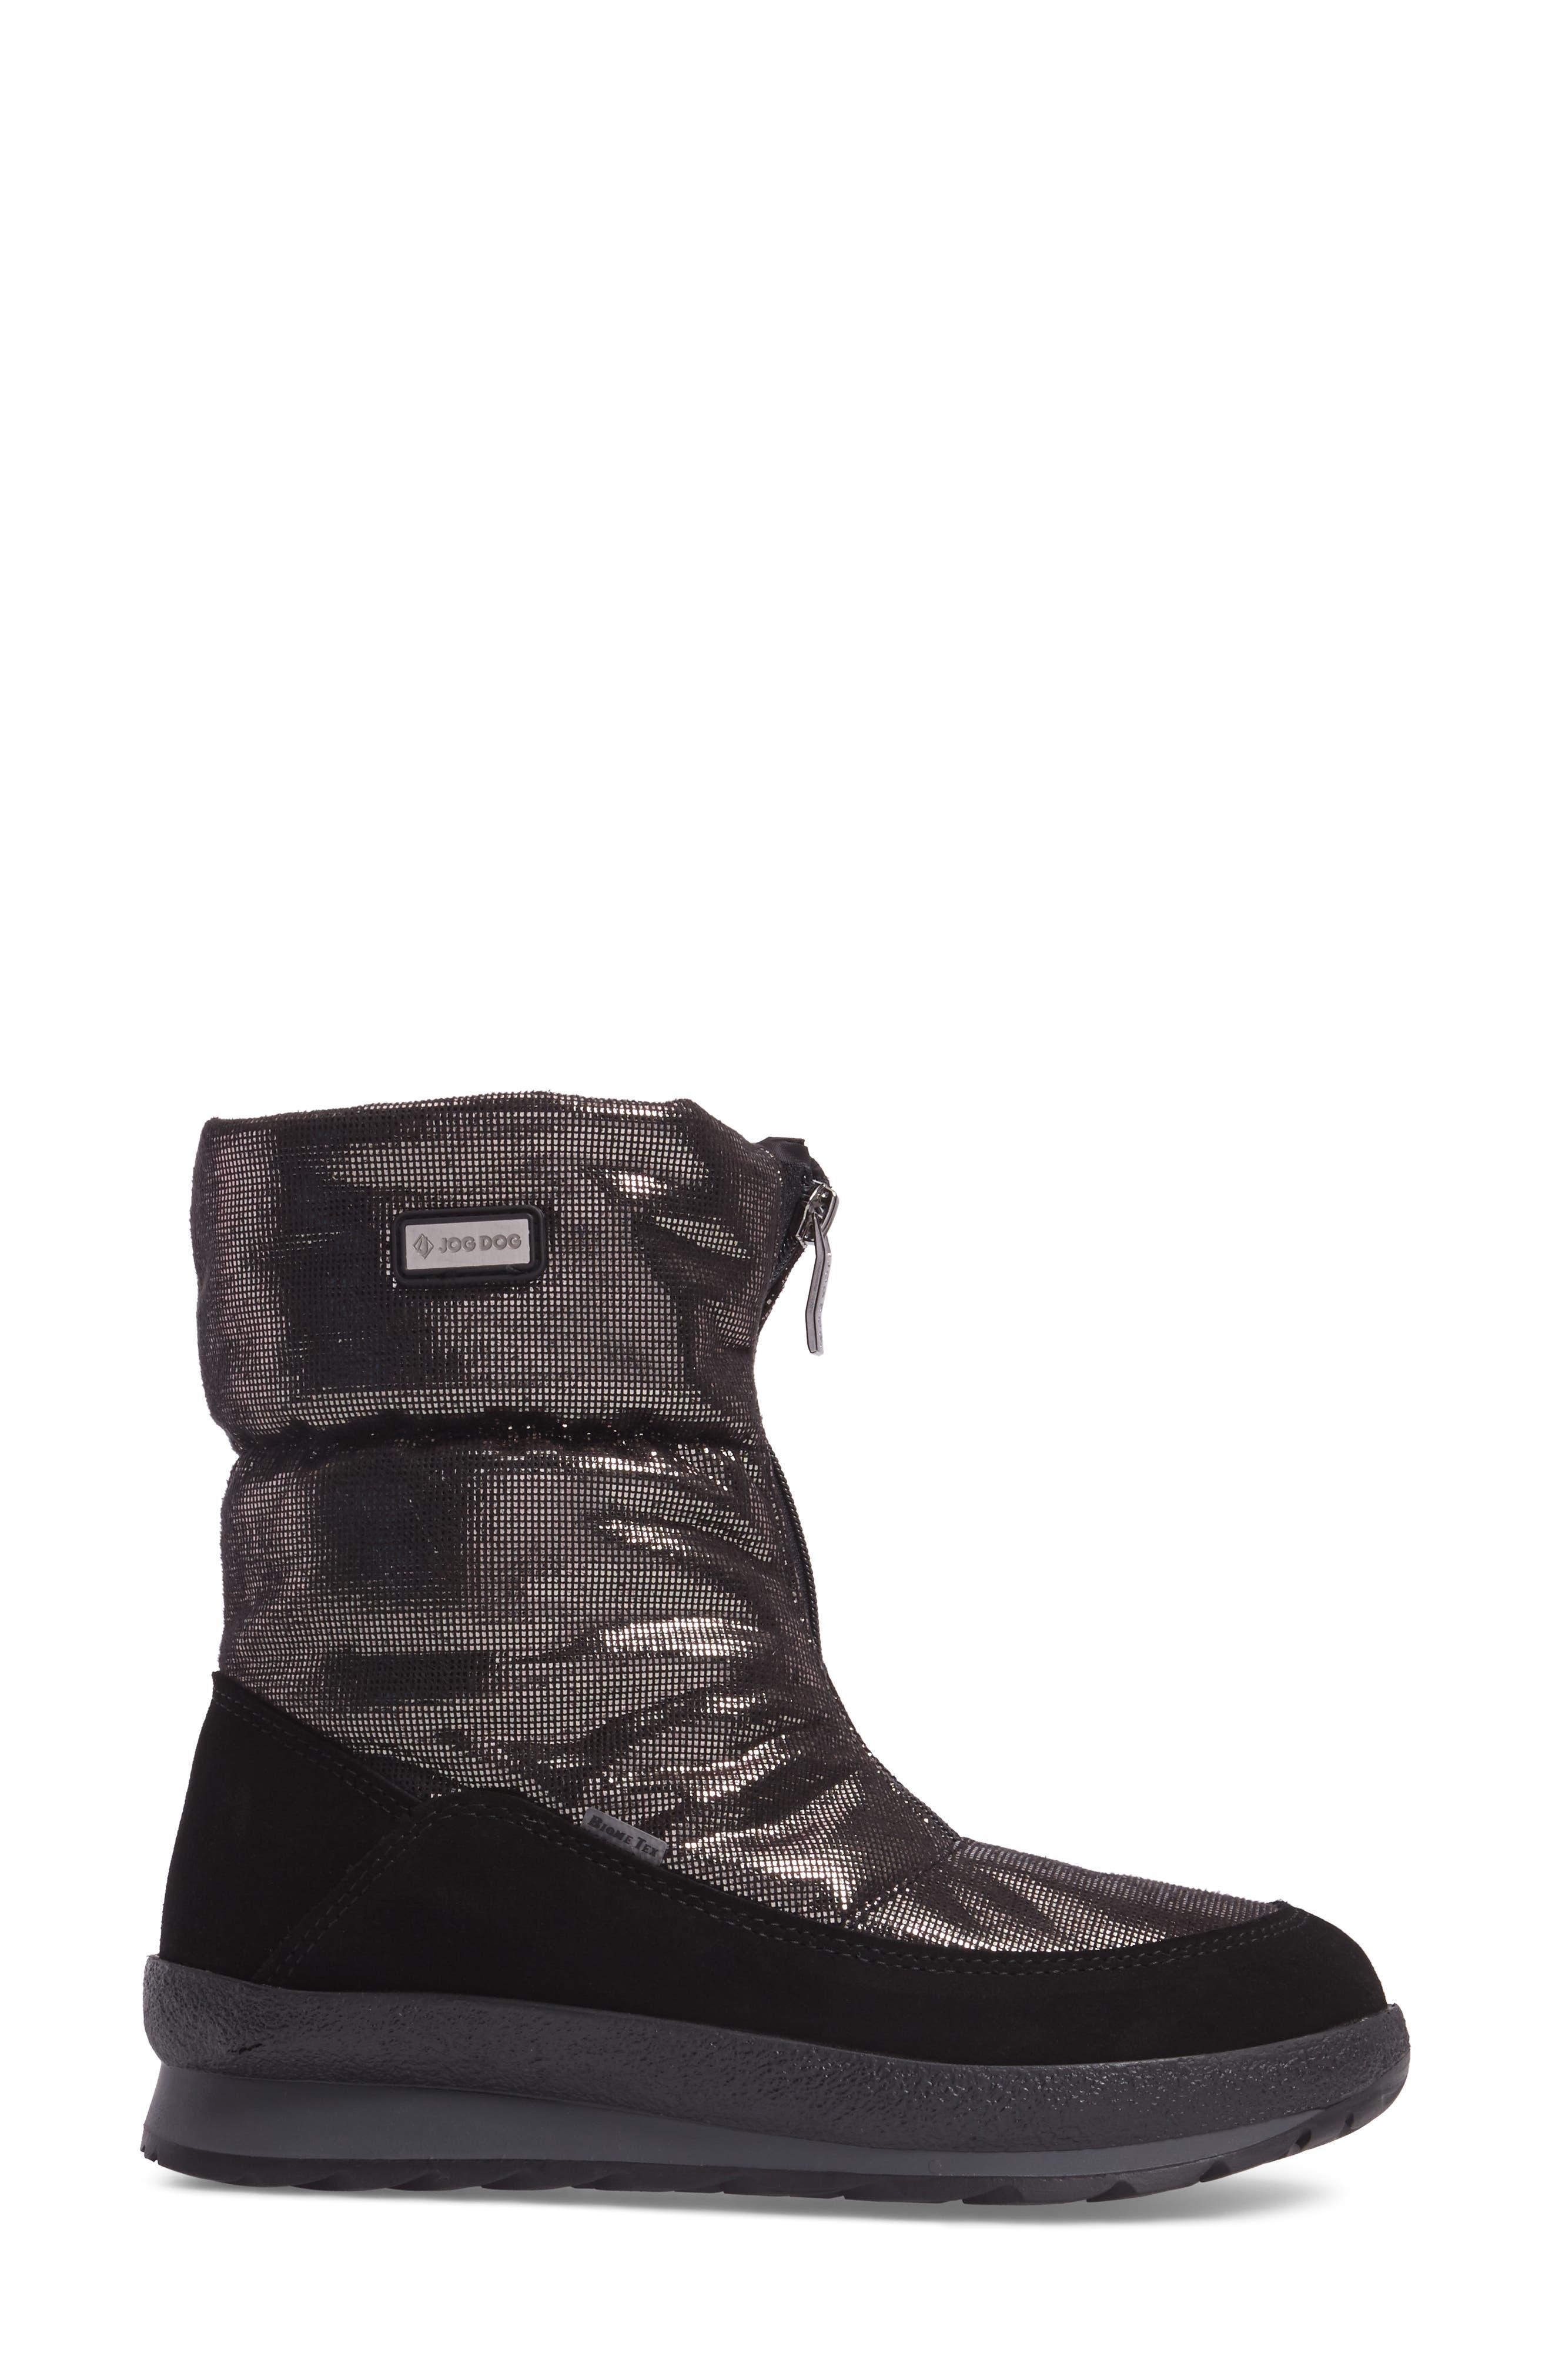 Val Gardena Waterproof Boot,                             Alternate thumbnail 3, color,                             004